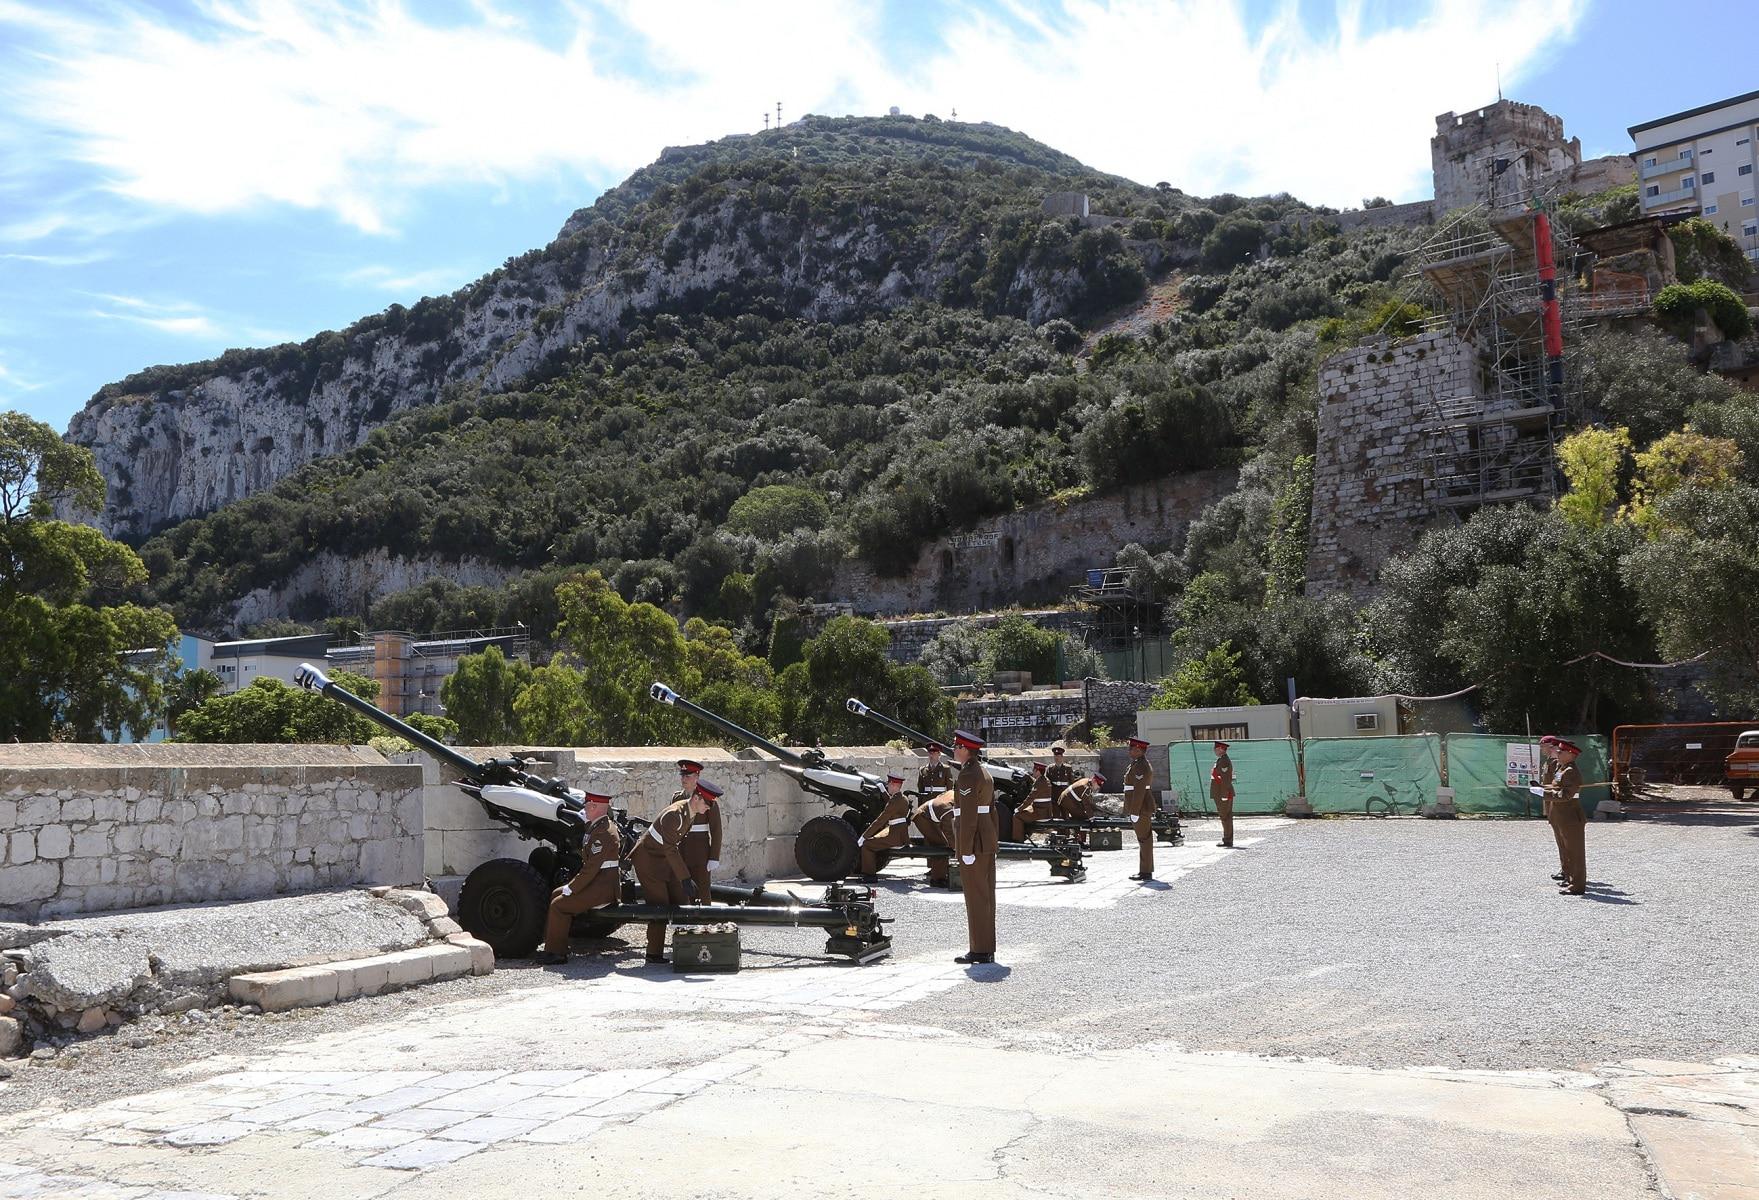 2-jun-2016-salvas-en-gibraltar-honor-al-aniversario-de-coronacin-de-la-reina_27319190762_o